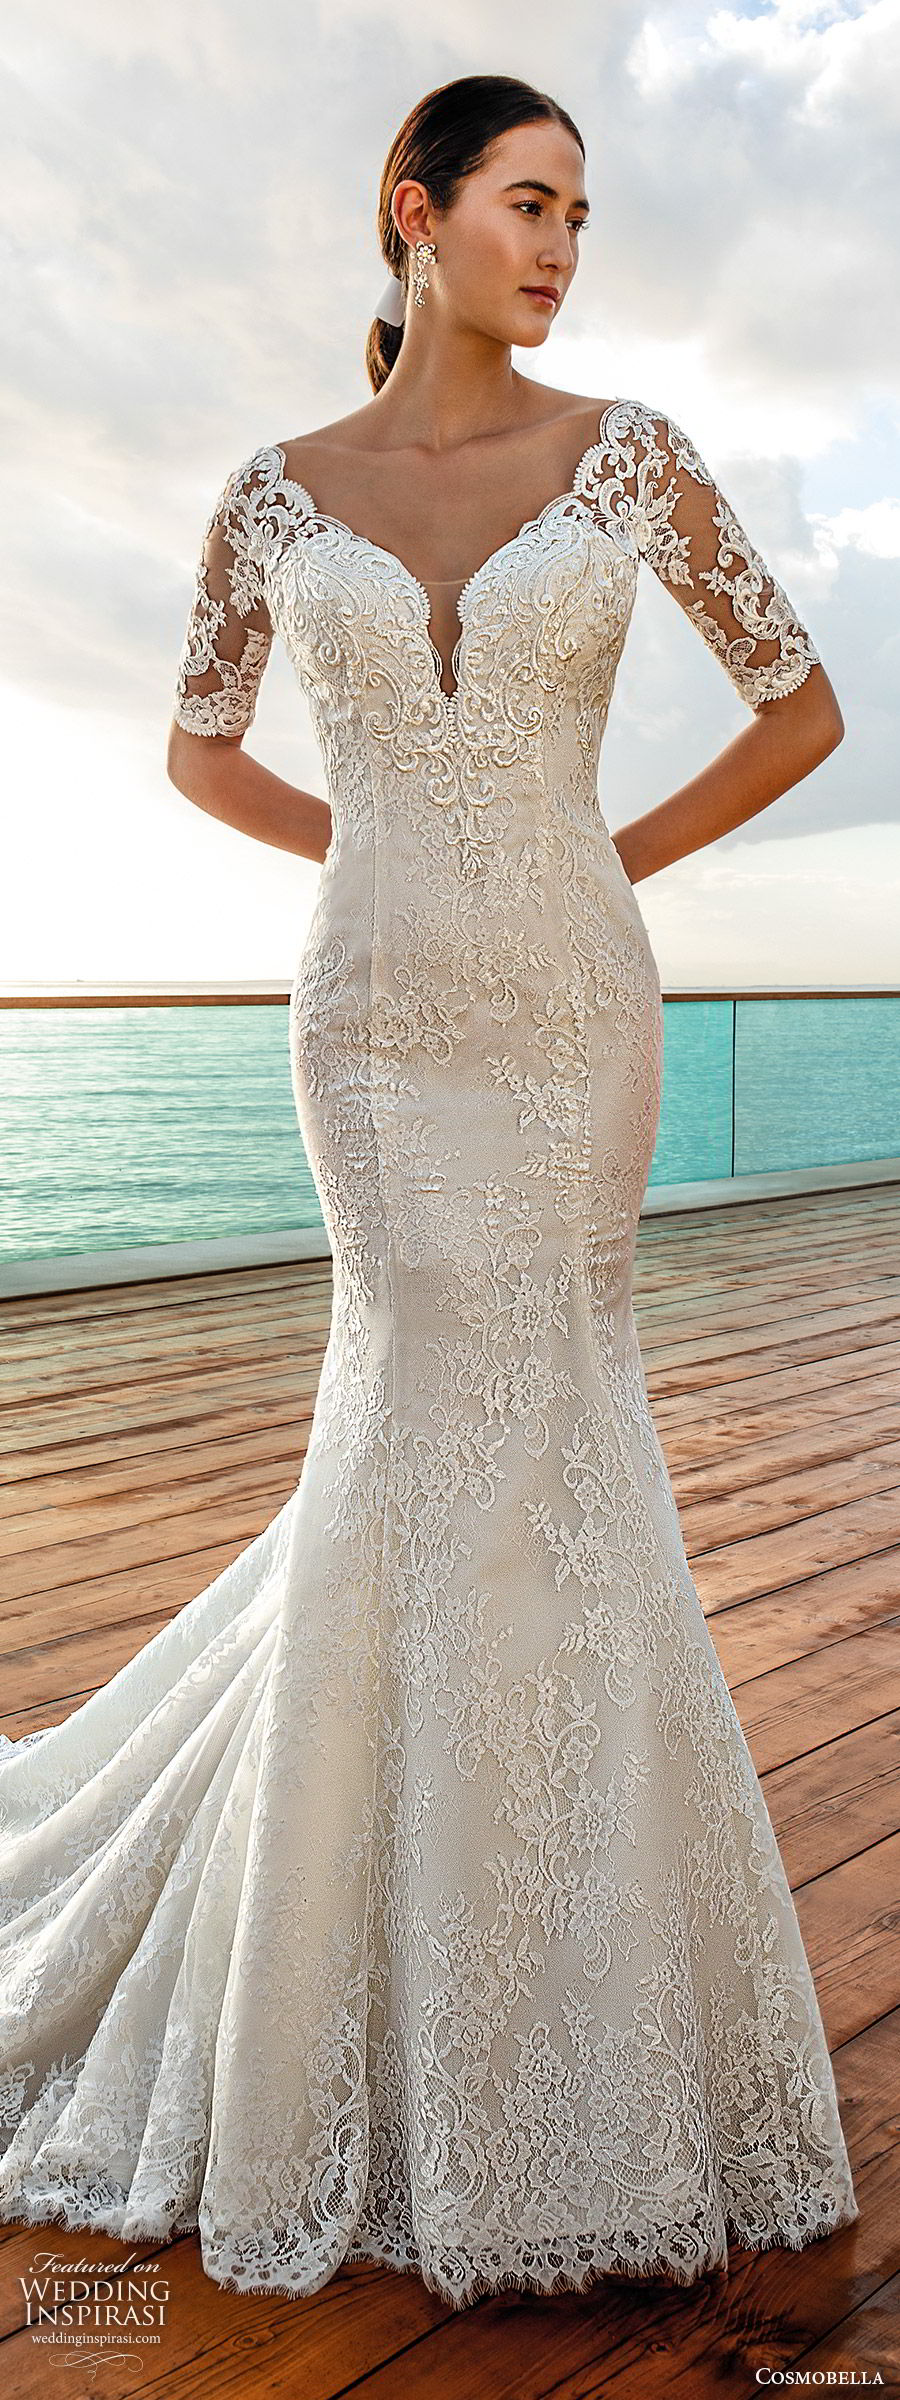 cosmobella 2020 bridal illusion half sleeves sweetheart neckline fully embellished lace fit flare trumpet mermaid wedding dress (6) romantic vintage chapel train mv